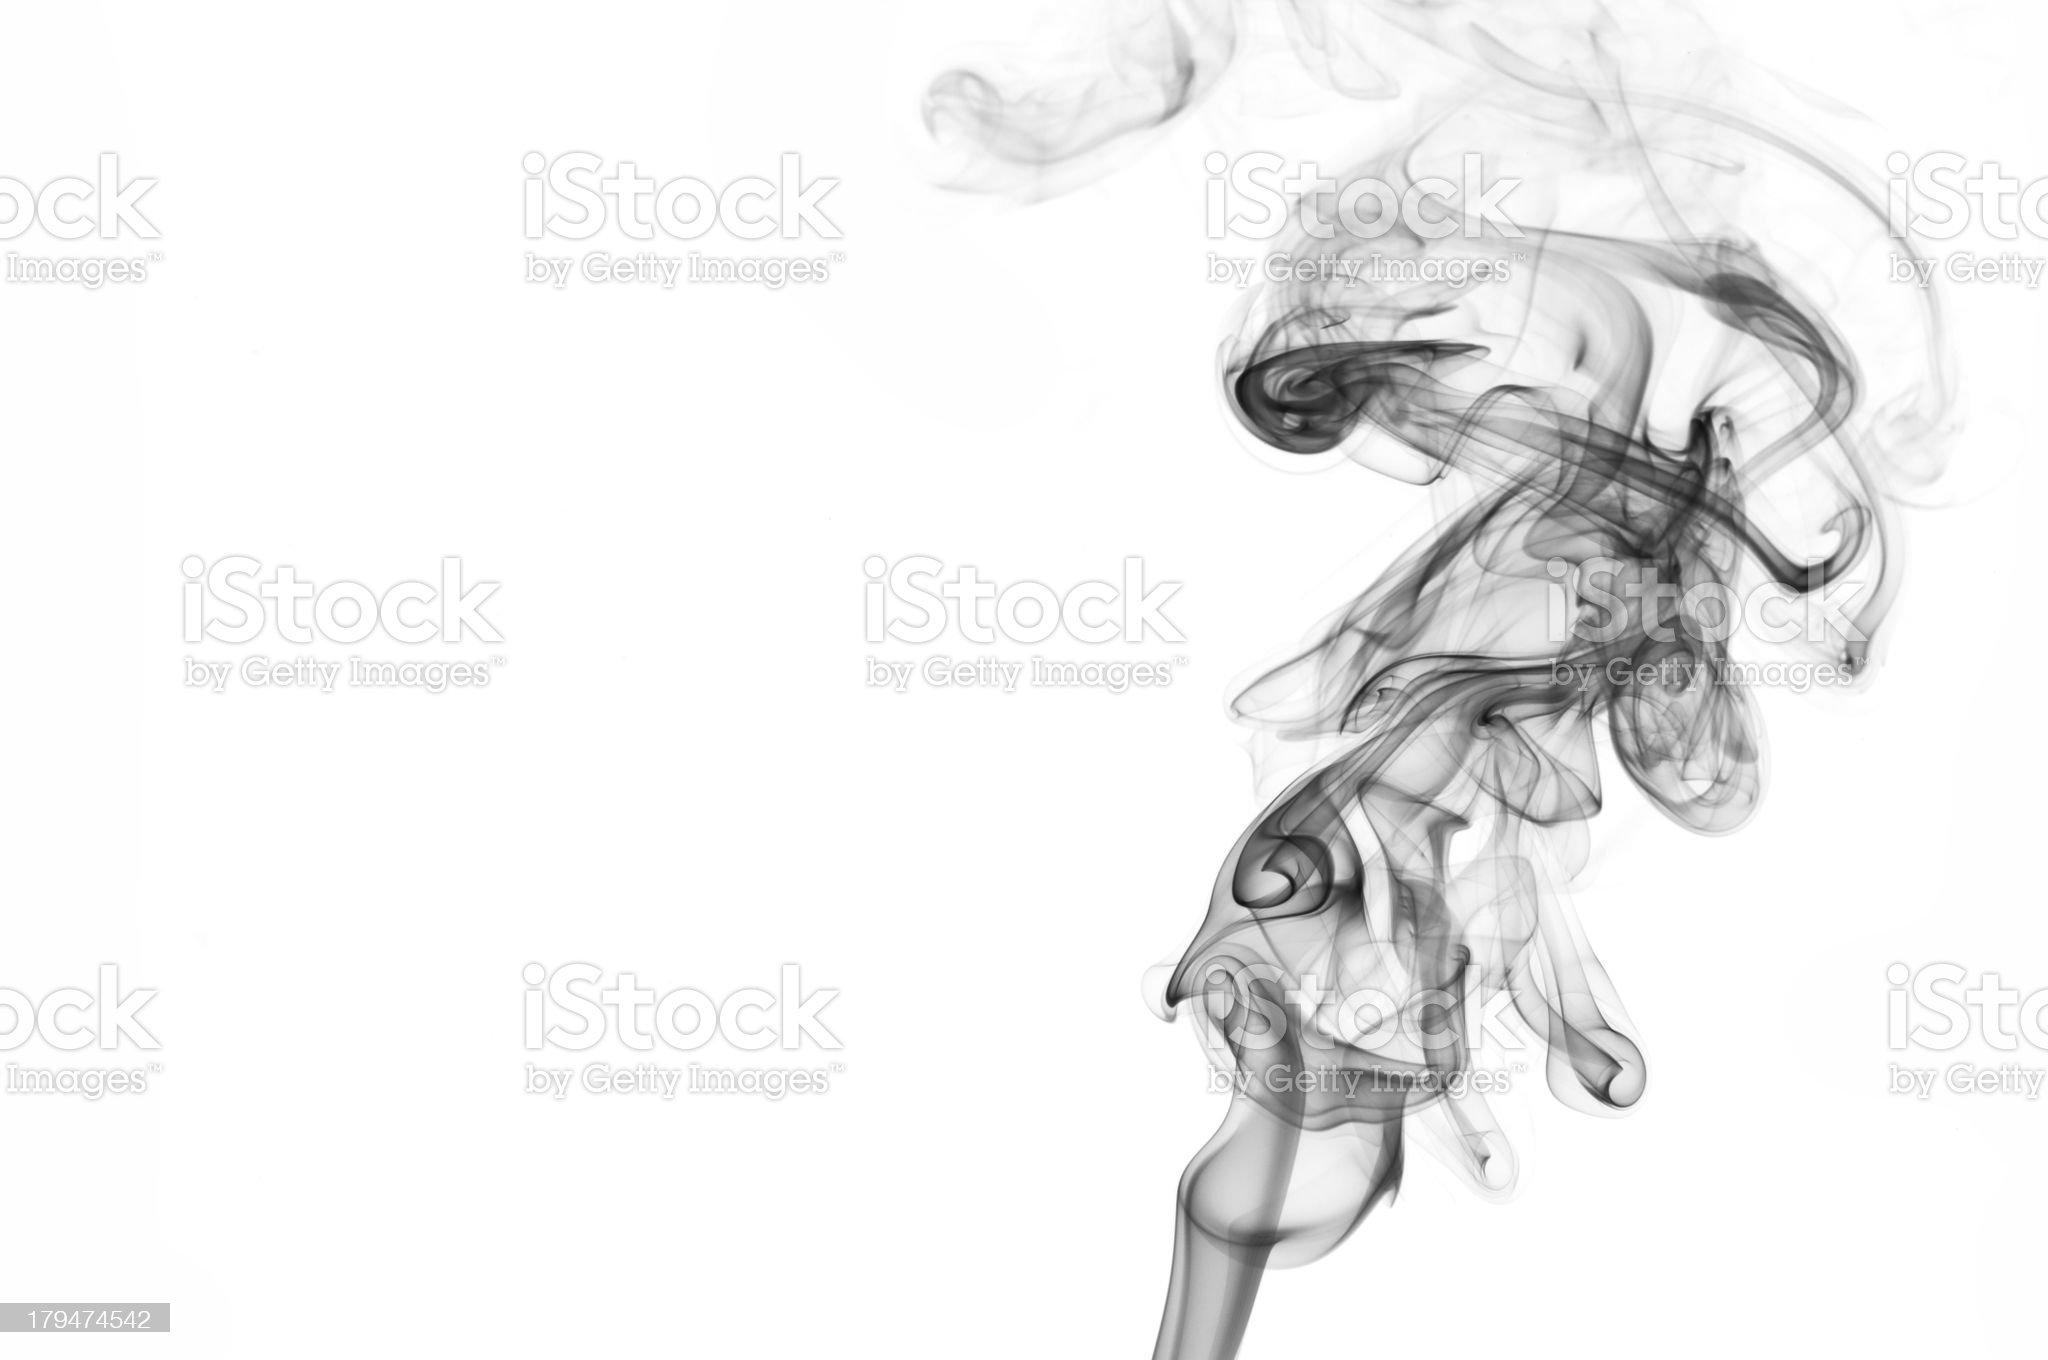 Abstract shape of black smoke on white background royalty-free stock photo